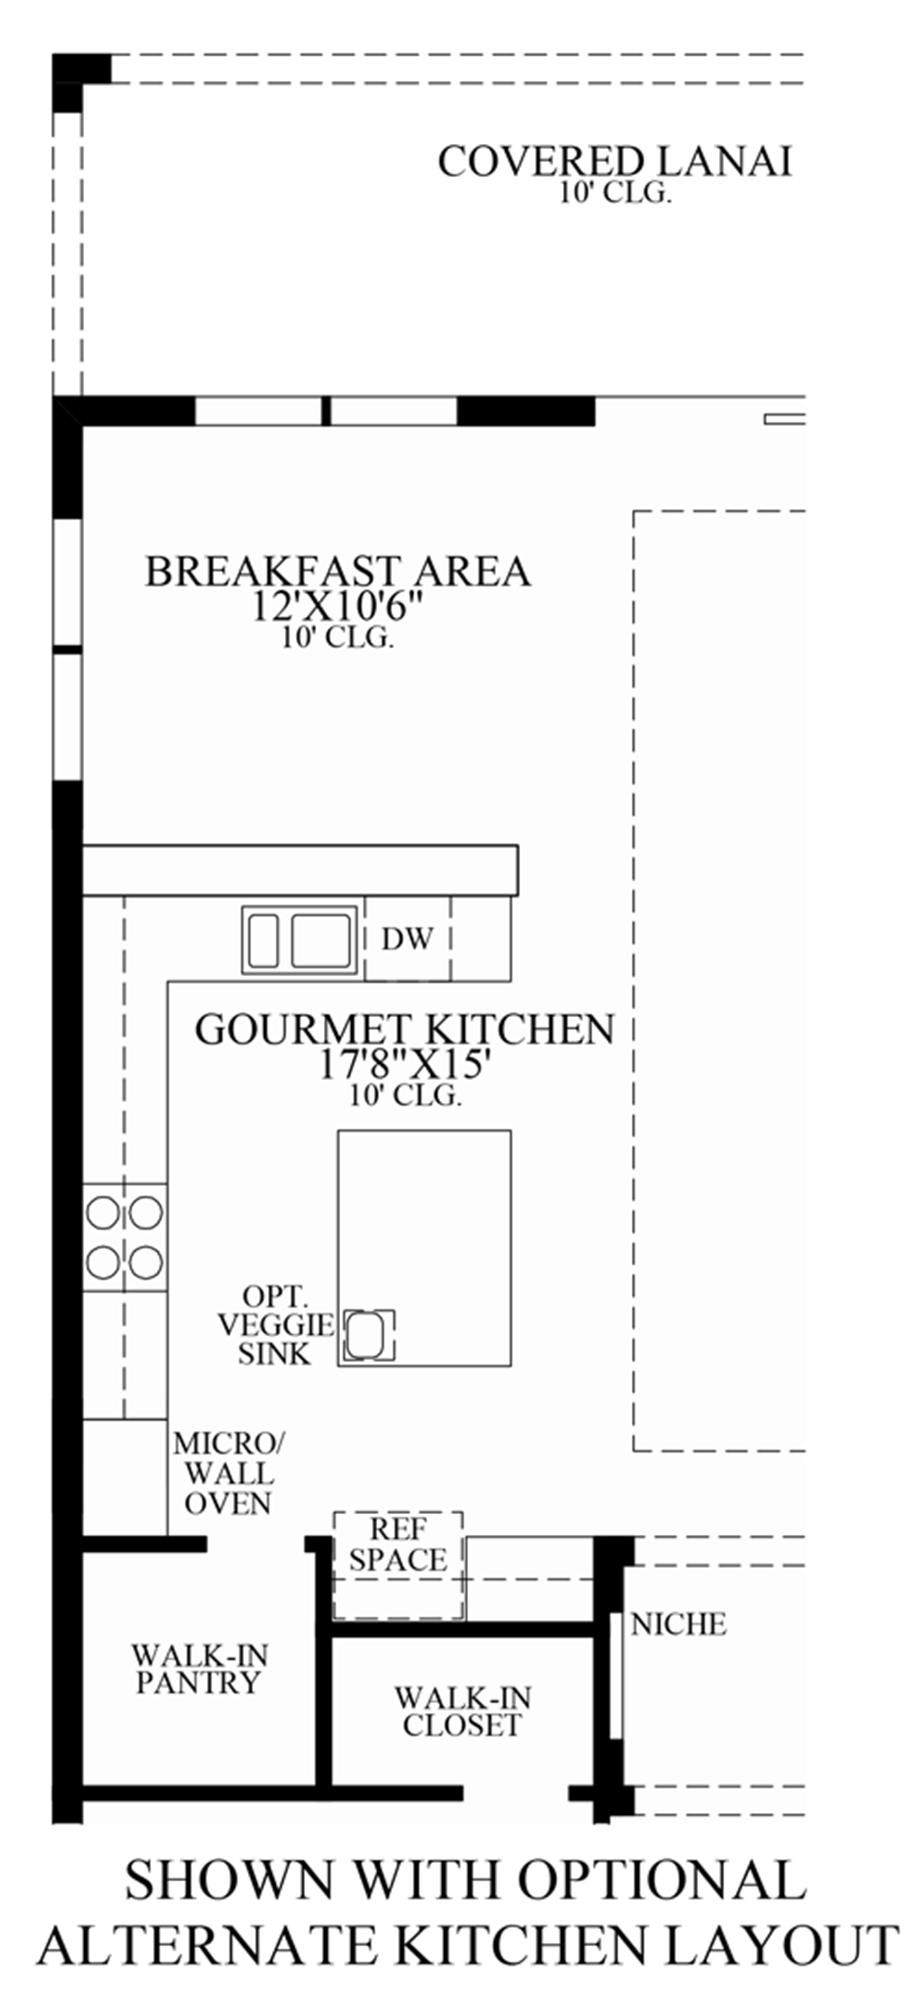 Optional Alternate Kitchen Layout Floor Plan